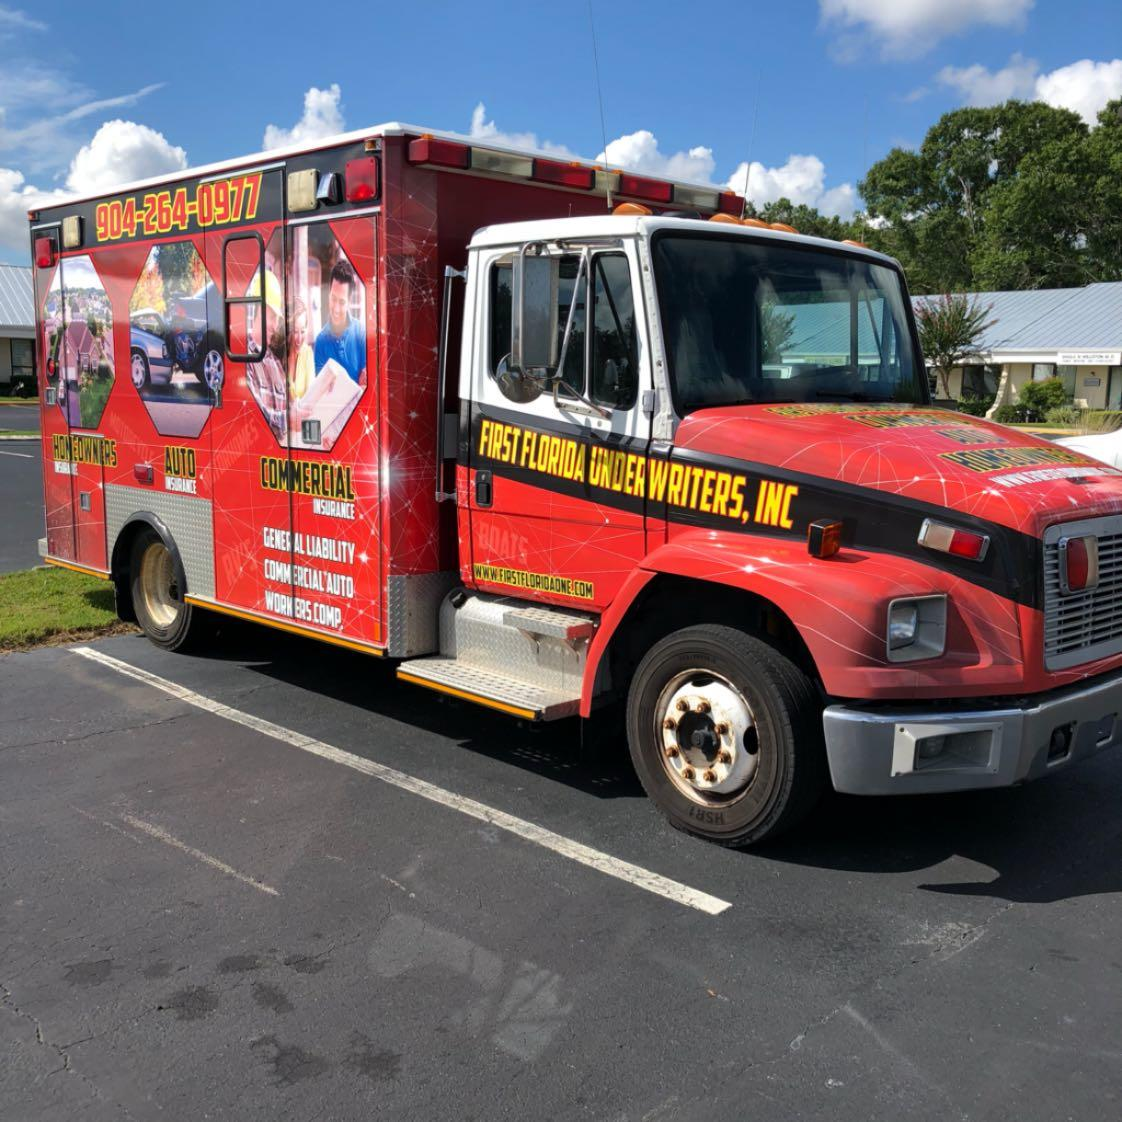 First Florida Underwriters Inc In Orange Park, FL 32073